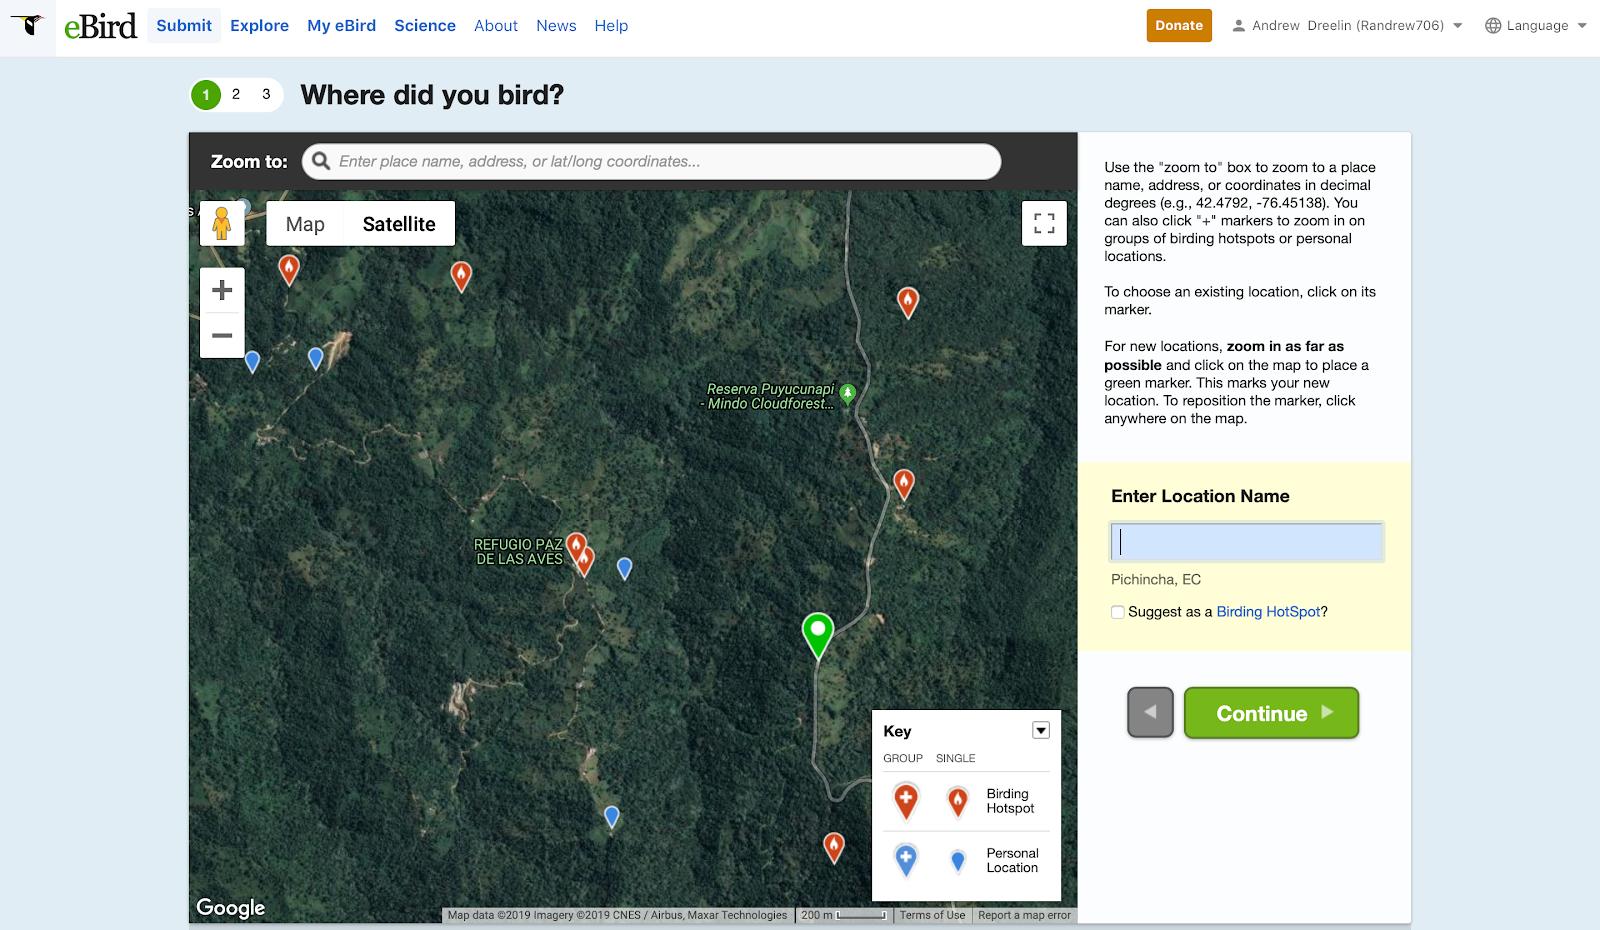 eBird website location selection